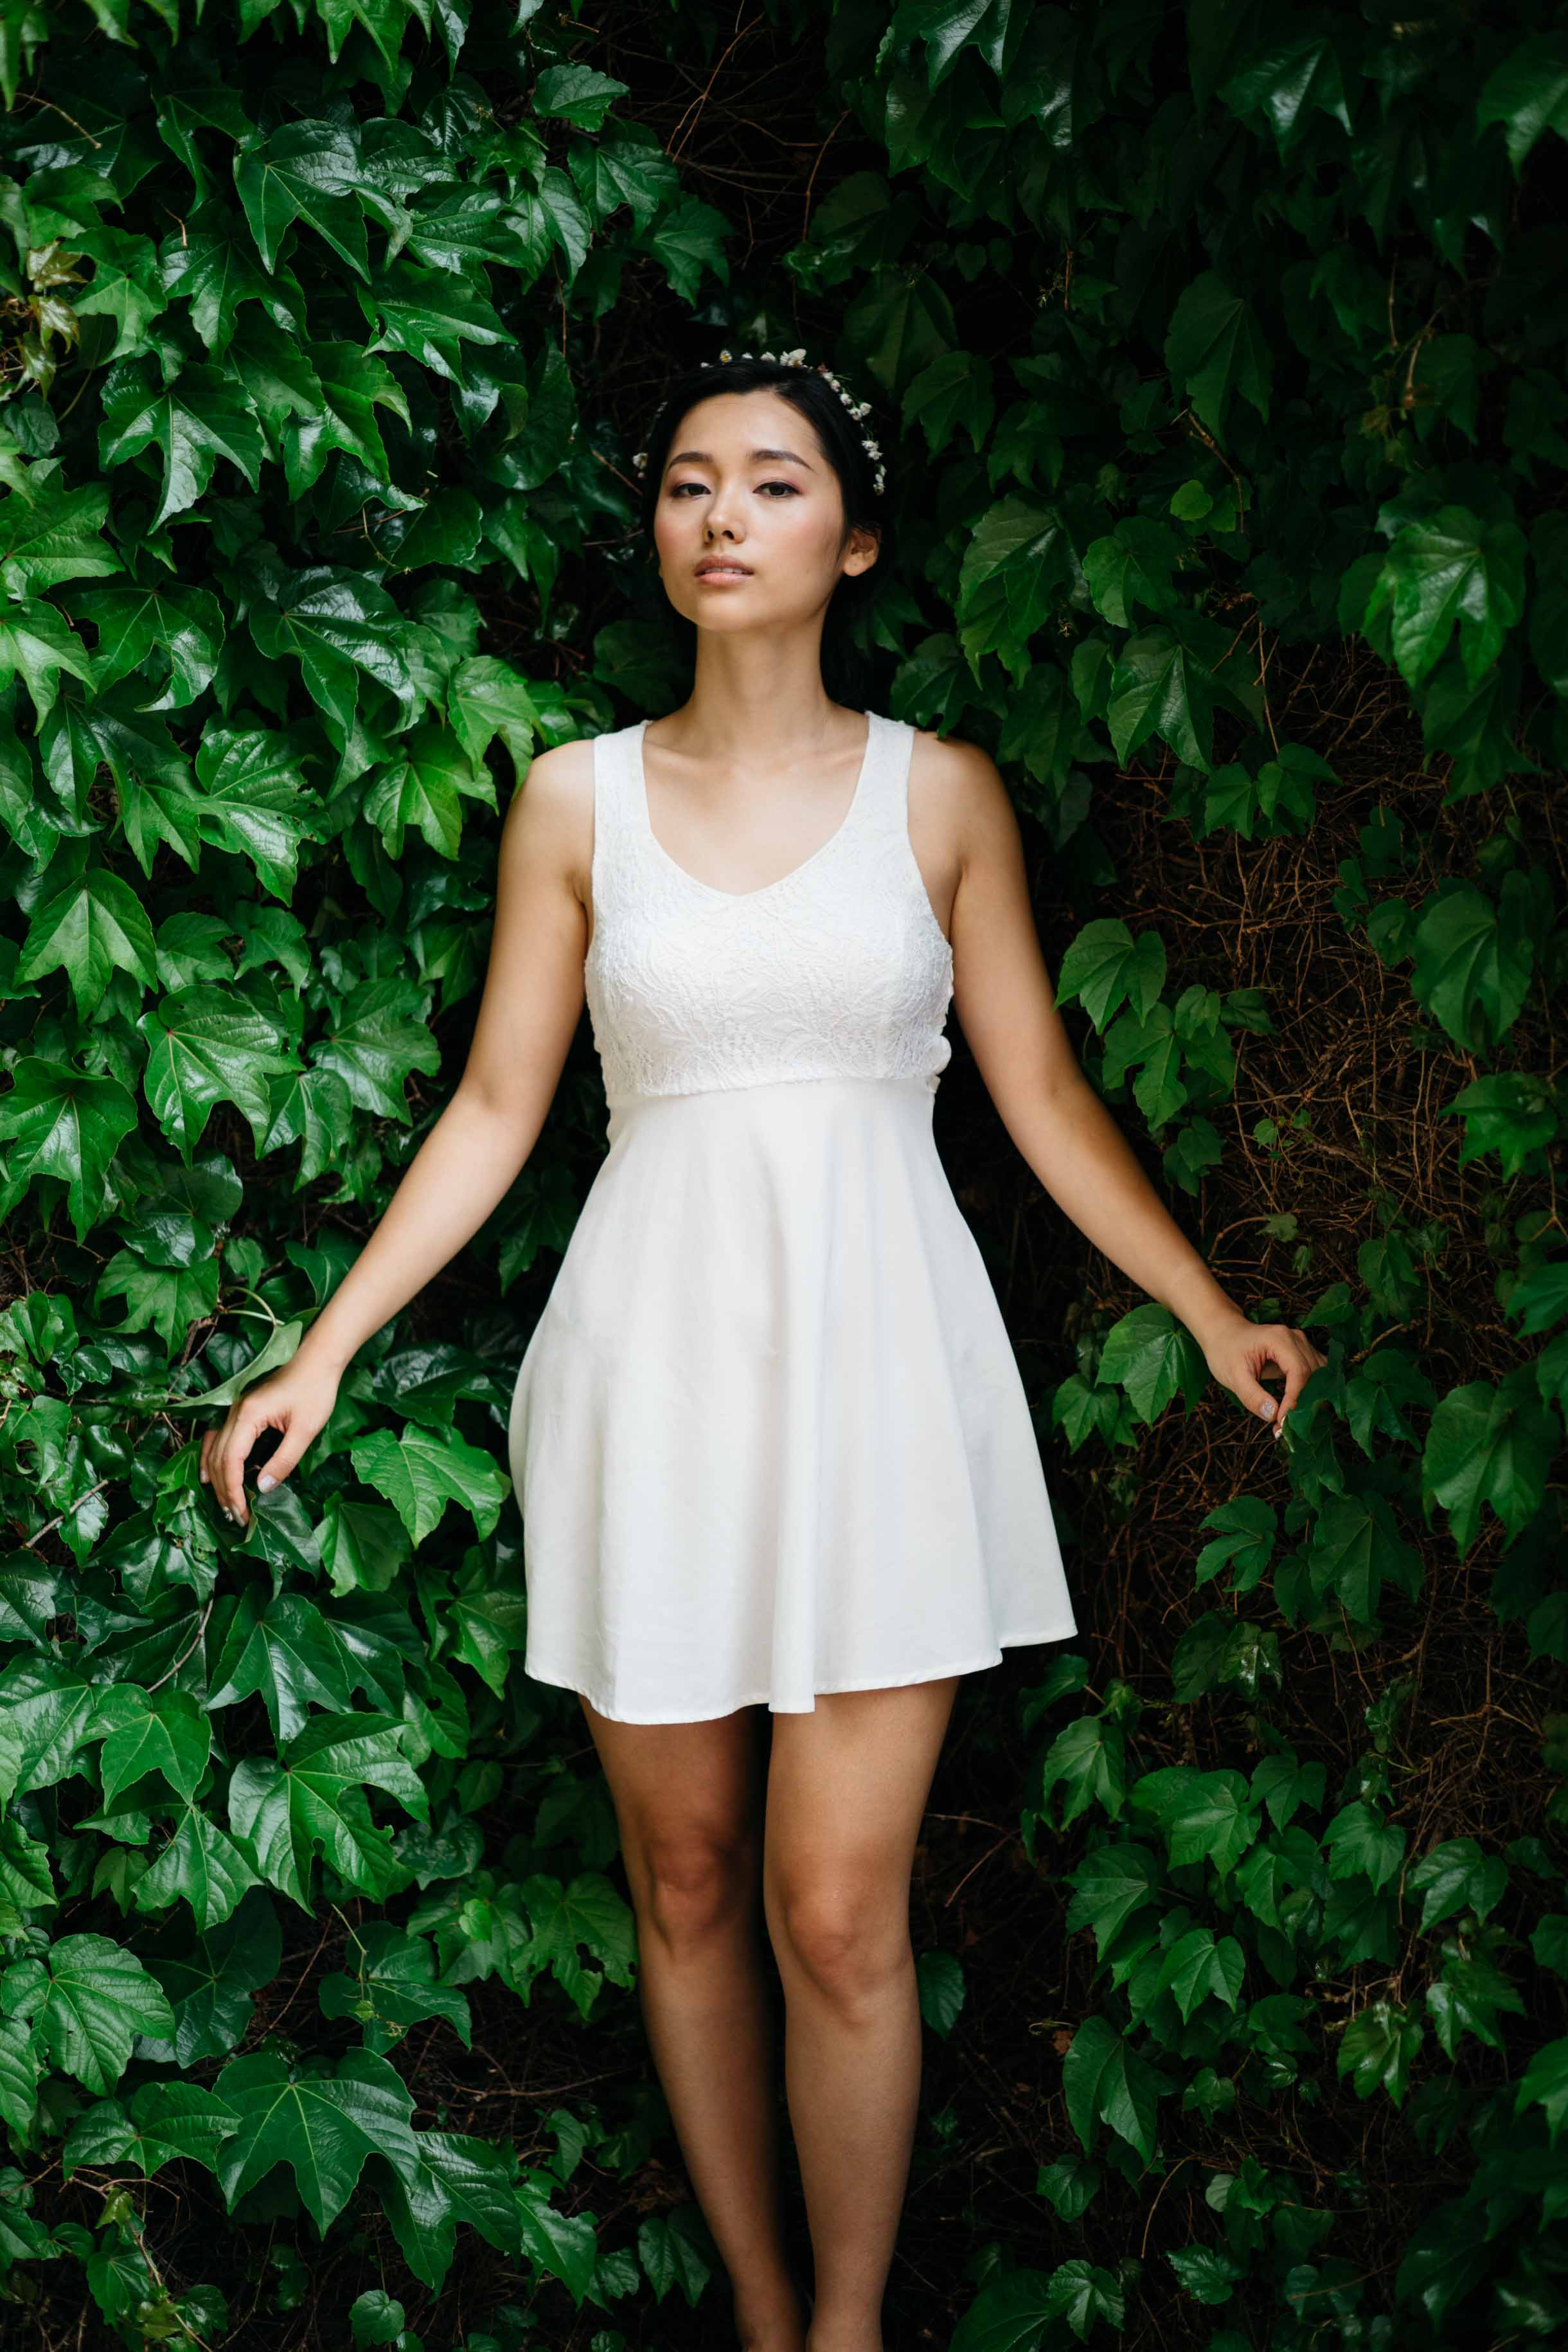 ELPIX_Portrait_ChloeSydU2016-6.jpg